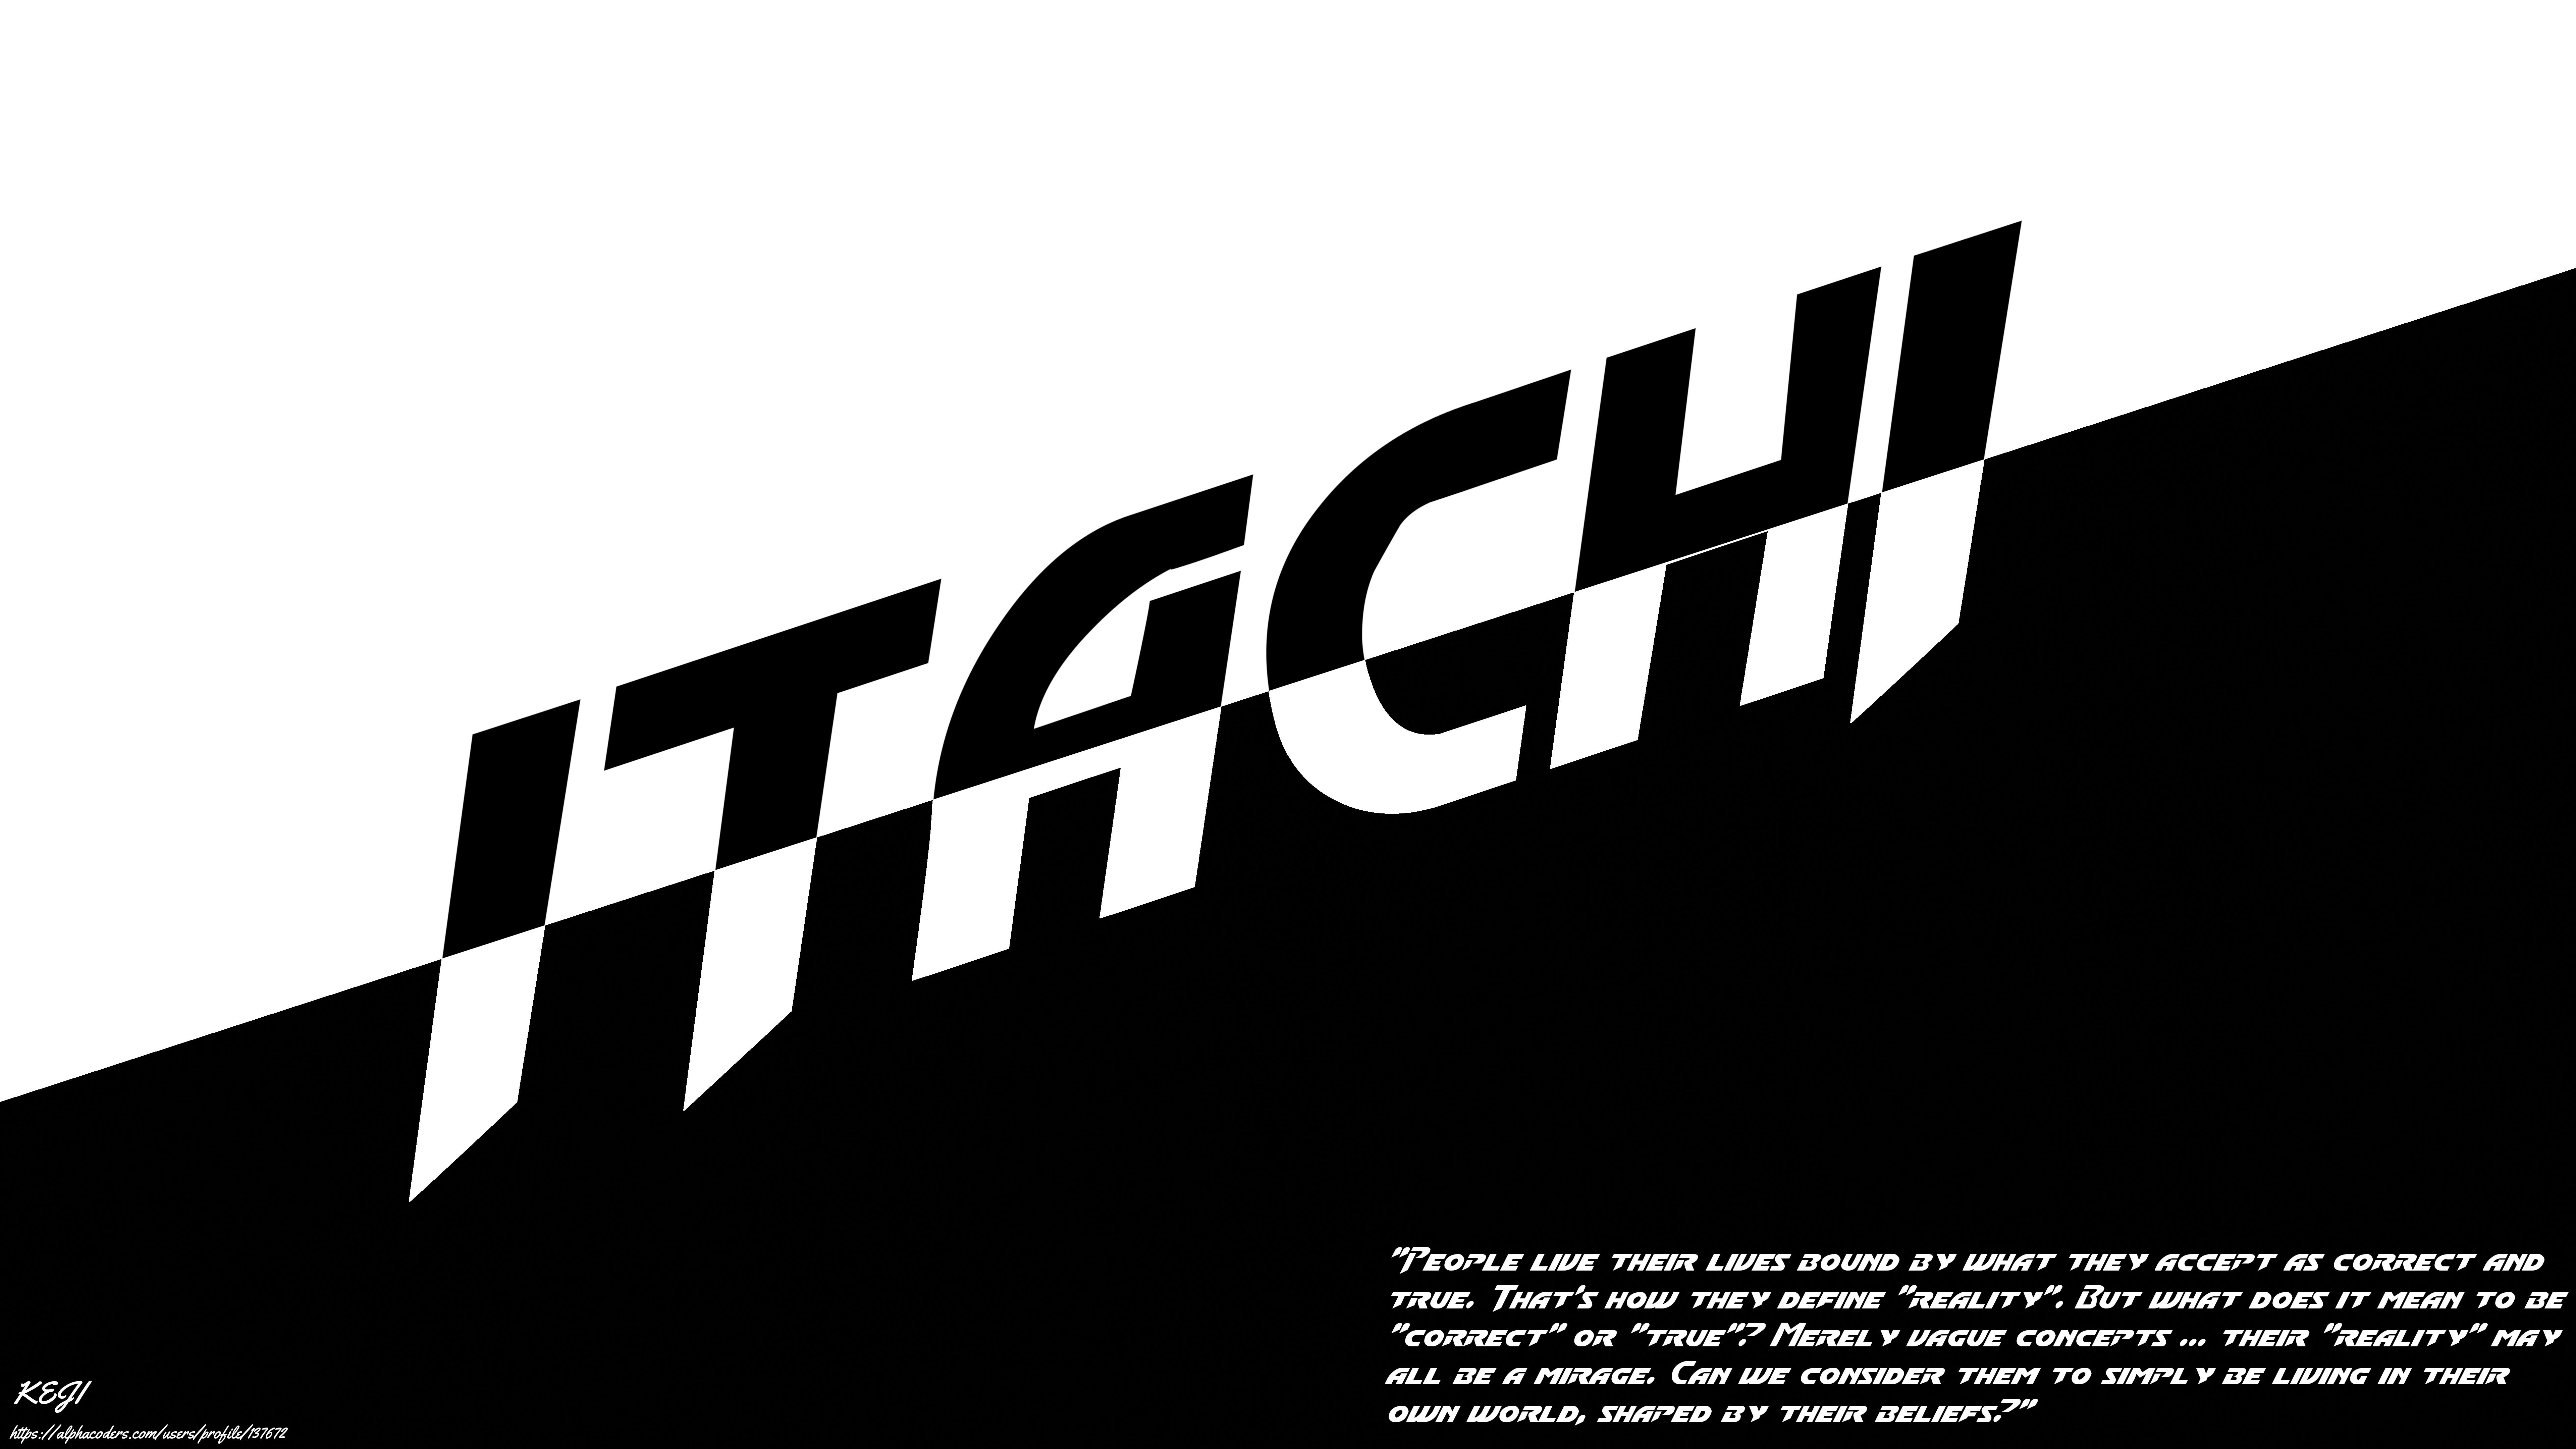 Itachi Uchiha 8k Ultra Hd Wallpaper Background Image 7680x4320 Id 942293 Wallpaper Abyss